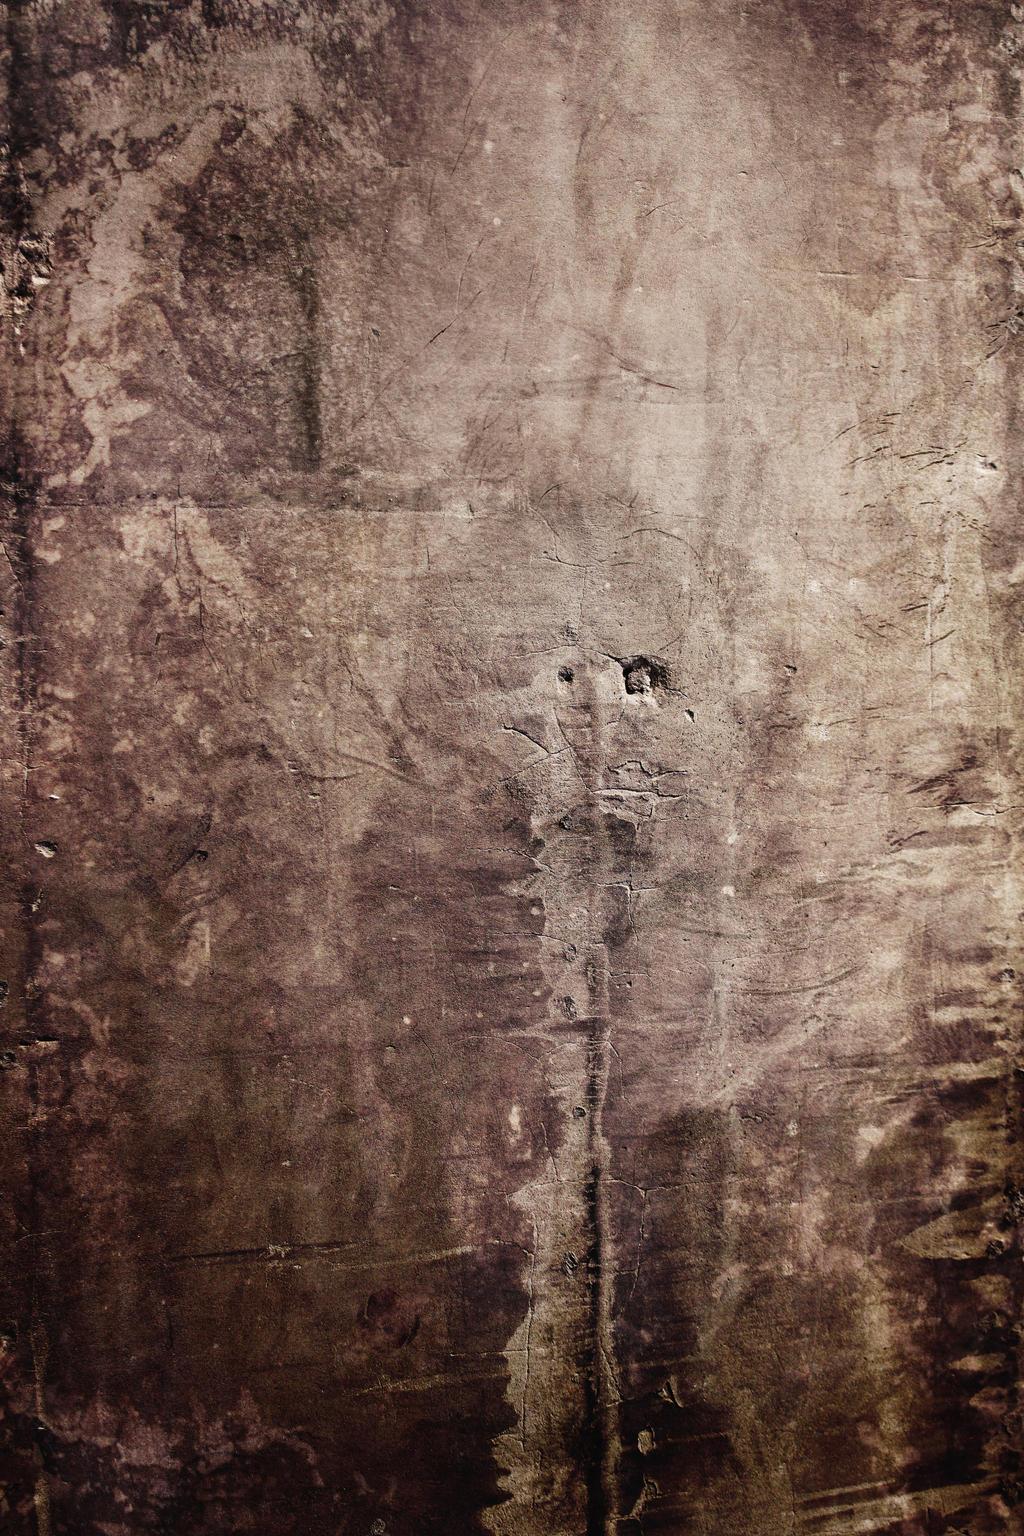 Digital Art Texture 116 by mercurycode